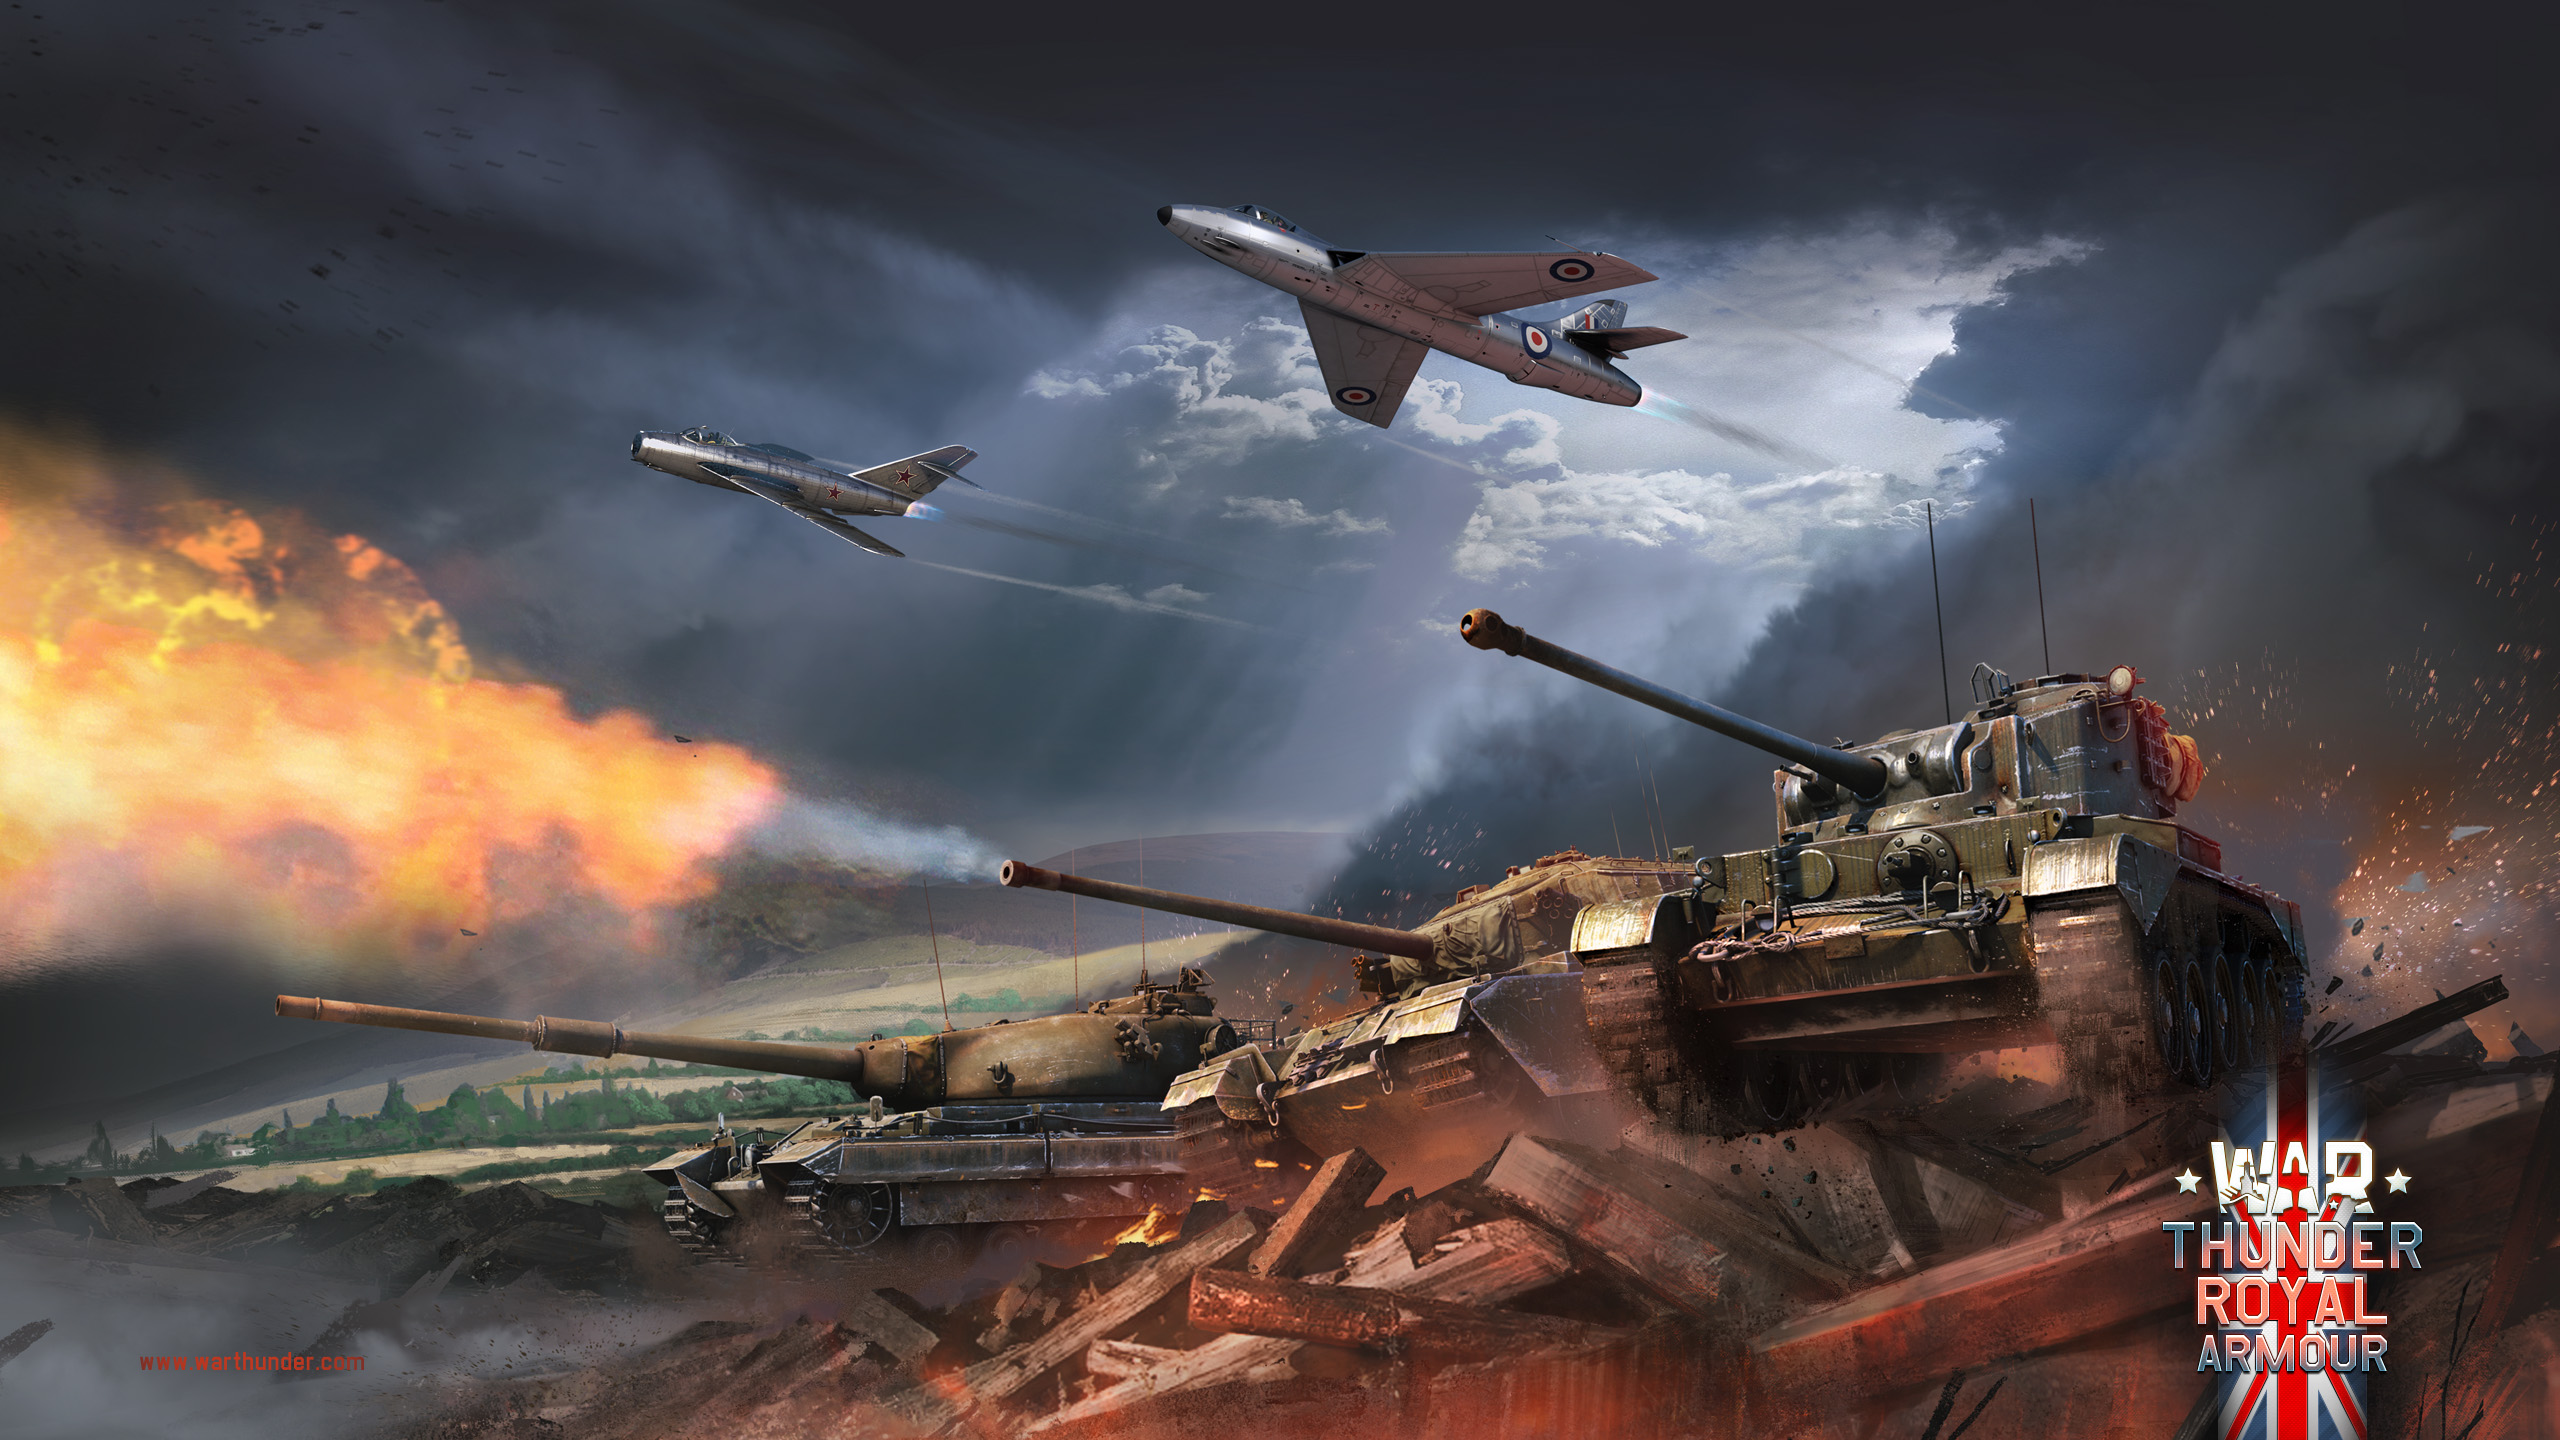 War thunder ground forces wallpaper designs